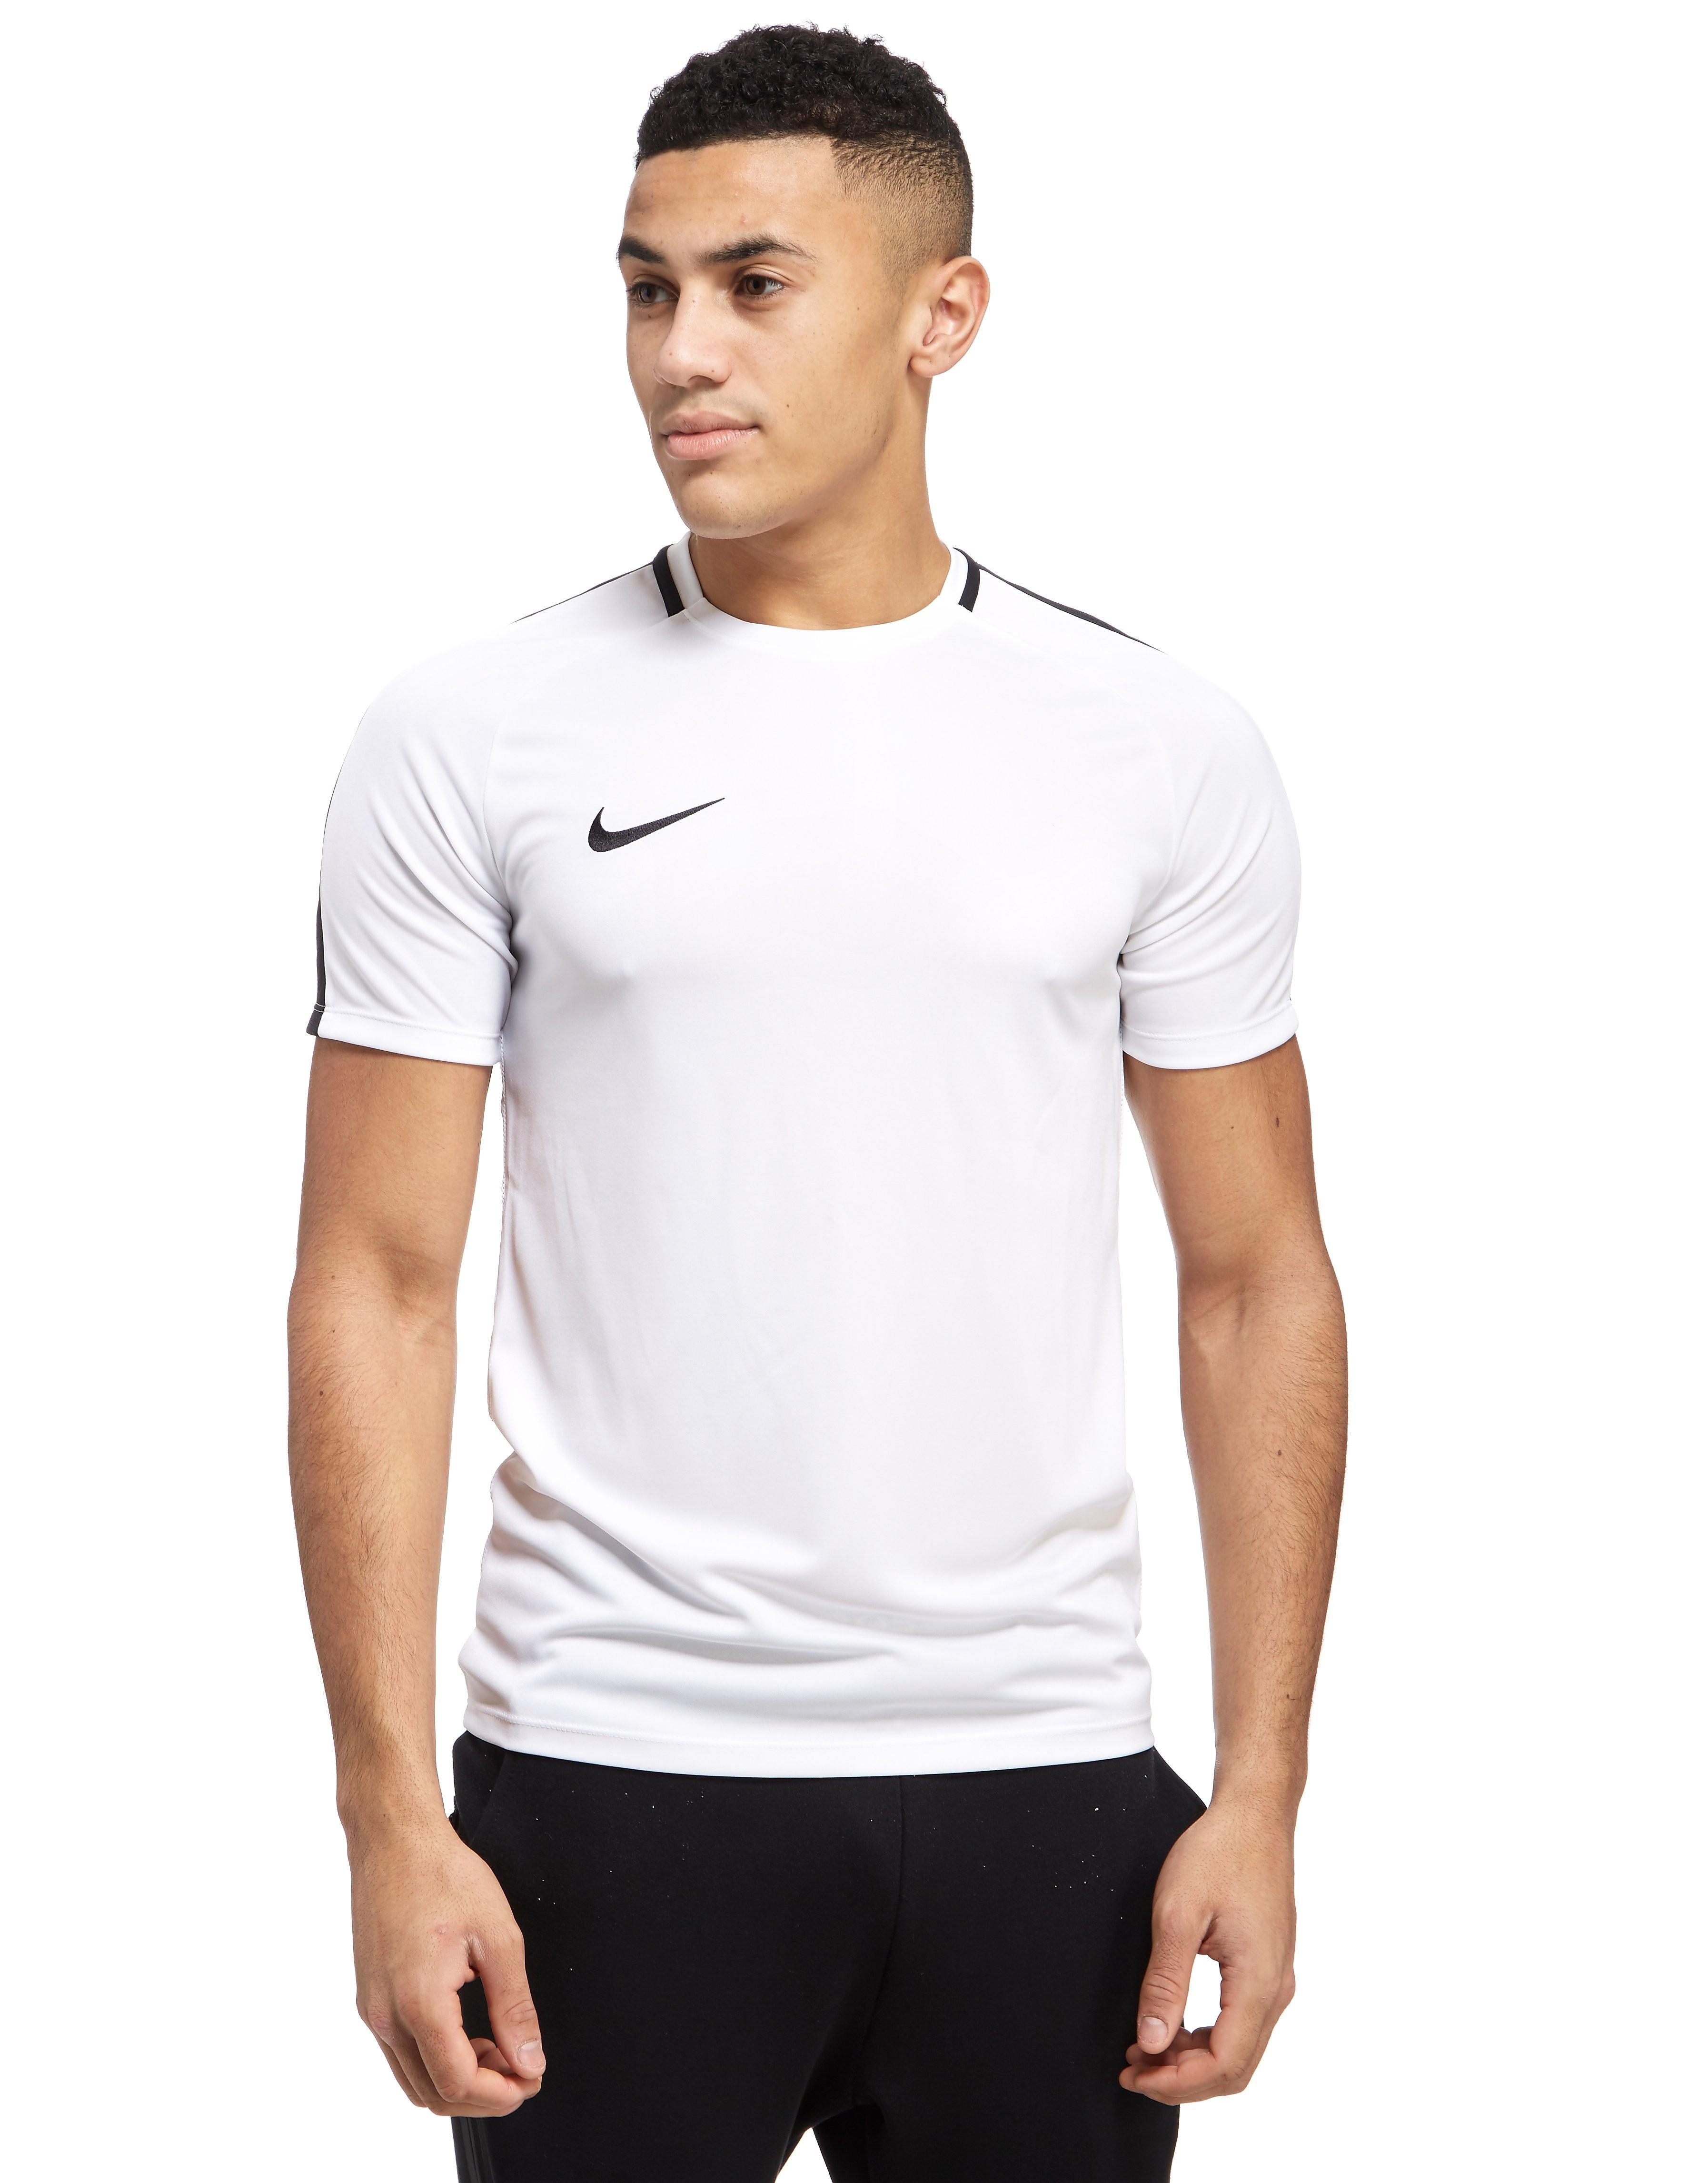 Nike T-shirt Academy 17